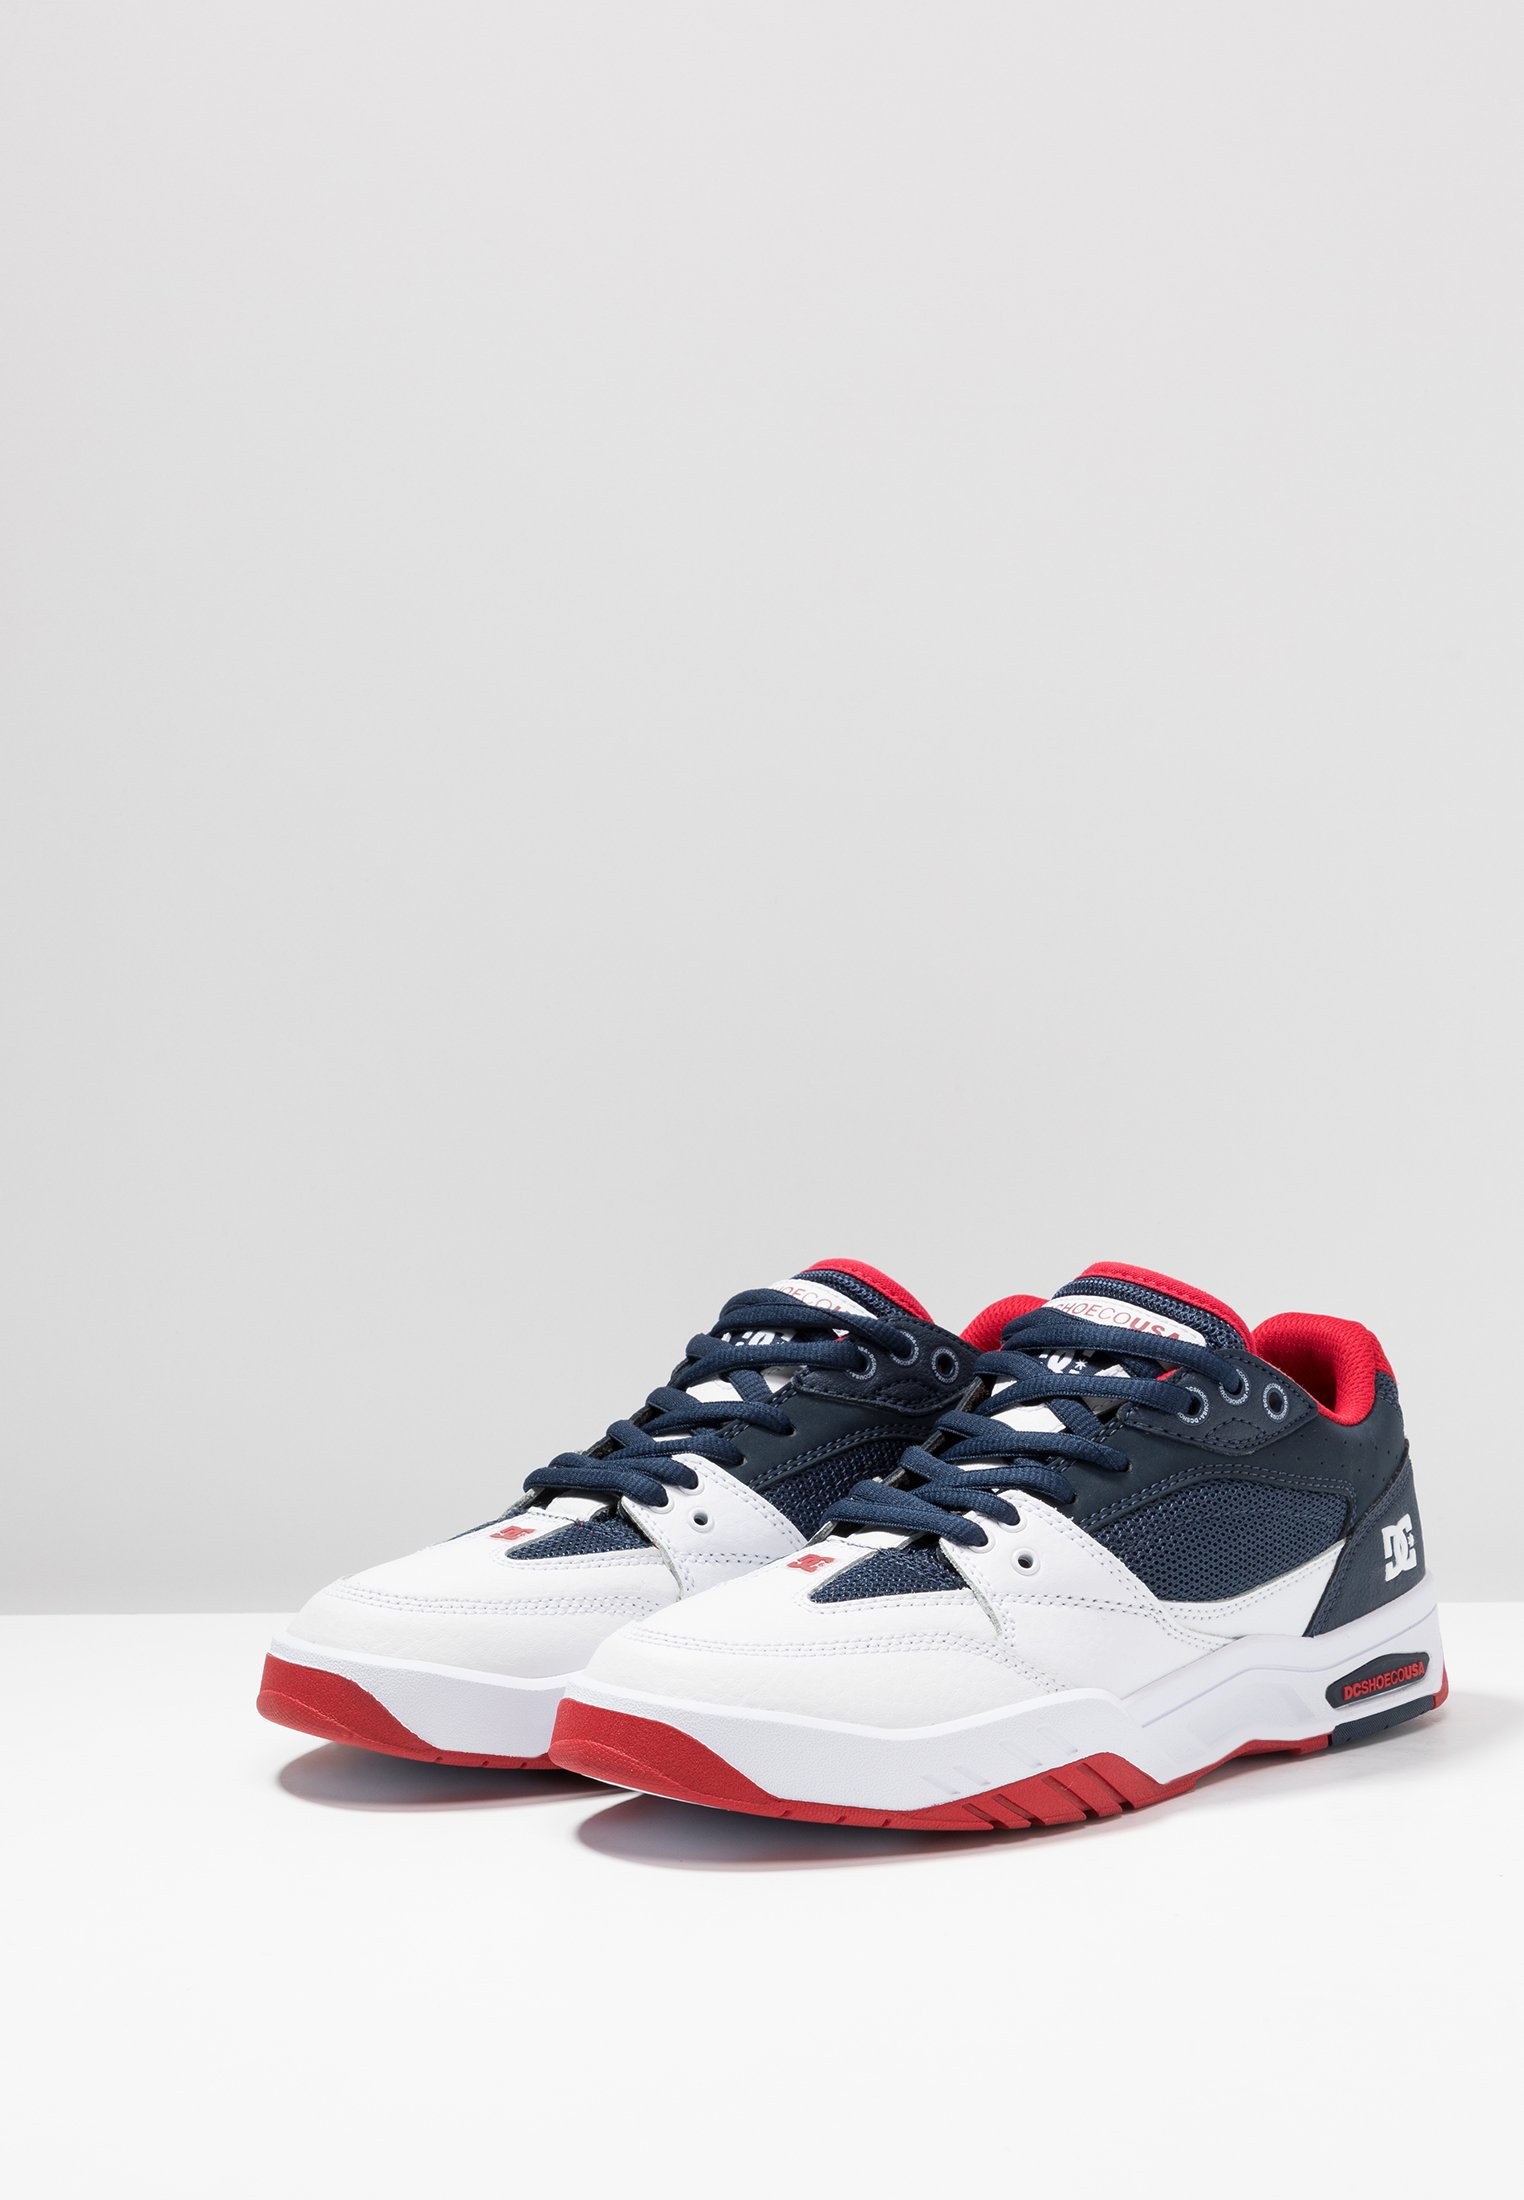 Geringster Preis DC Shoes MASWELL - Skateschuh - navy/white | Damenbekleidung 2020